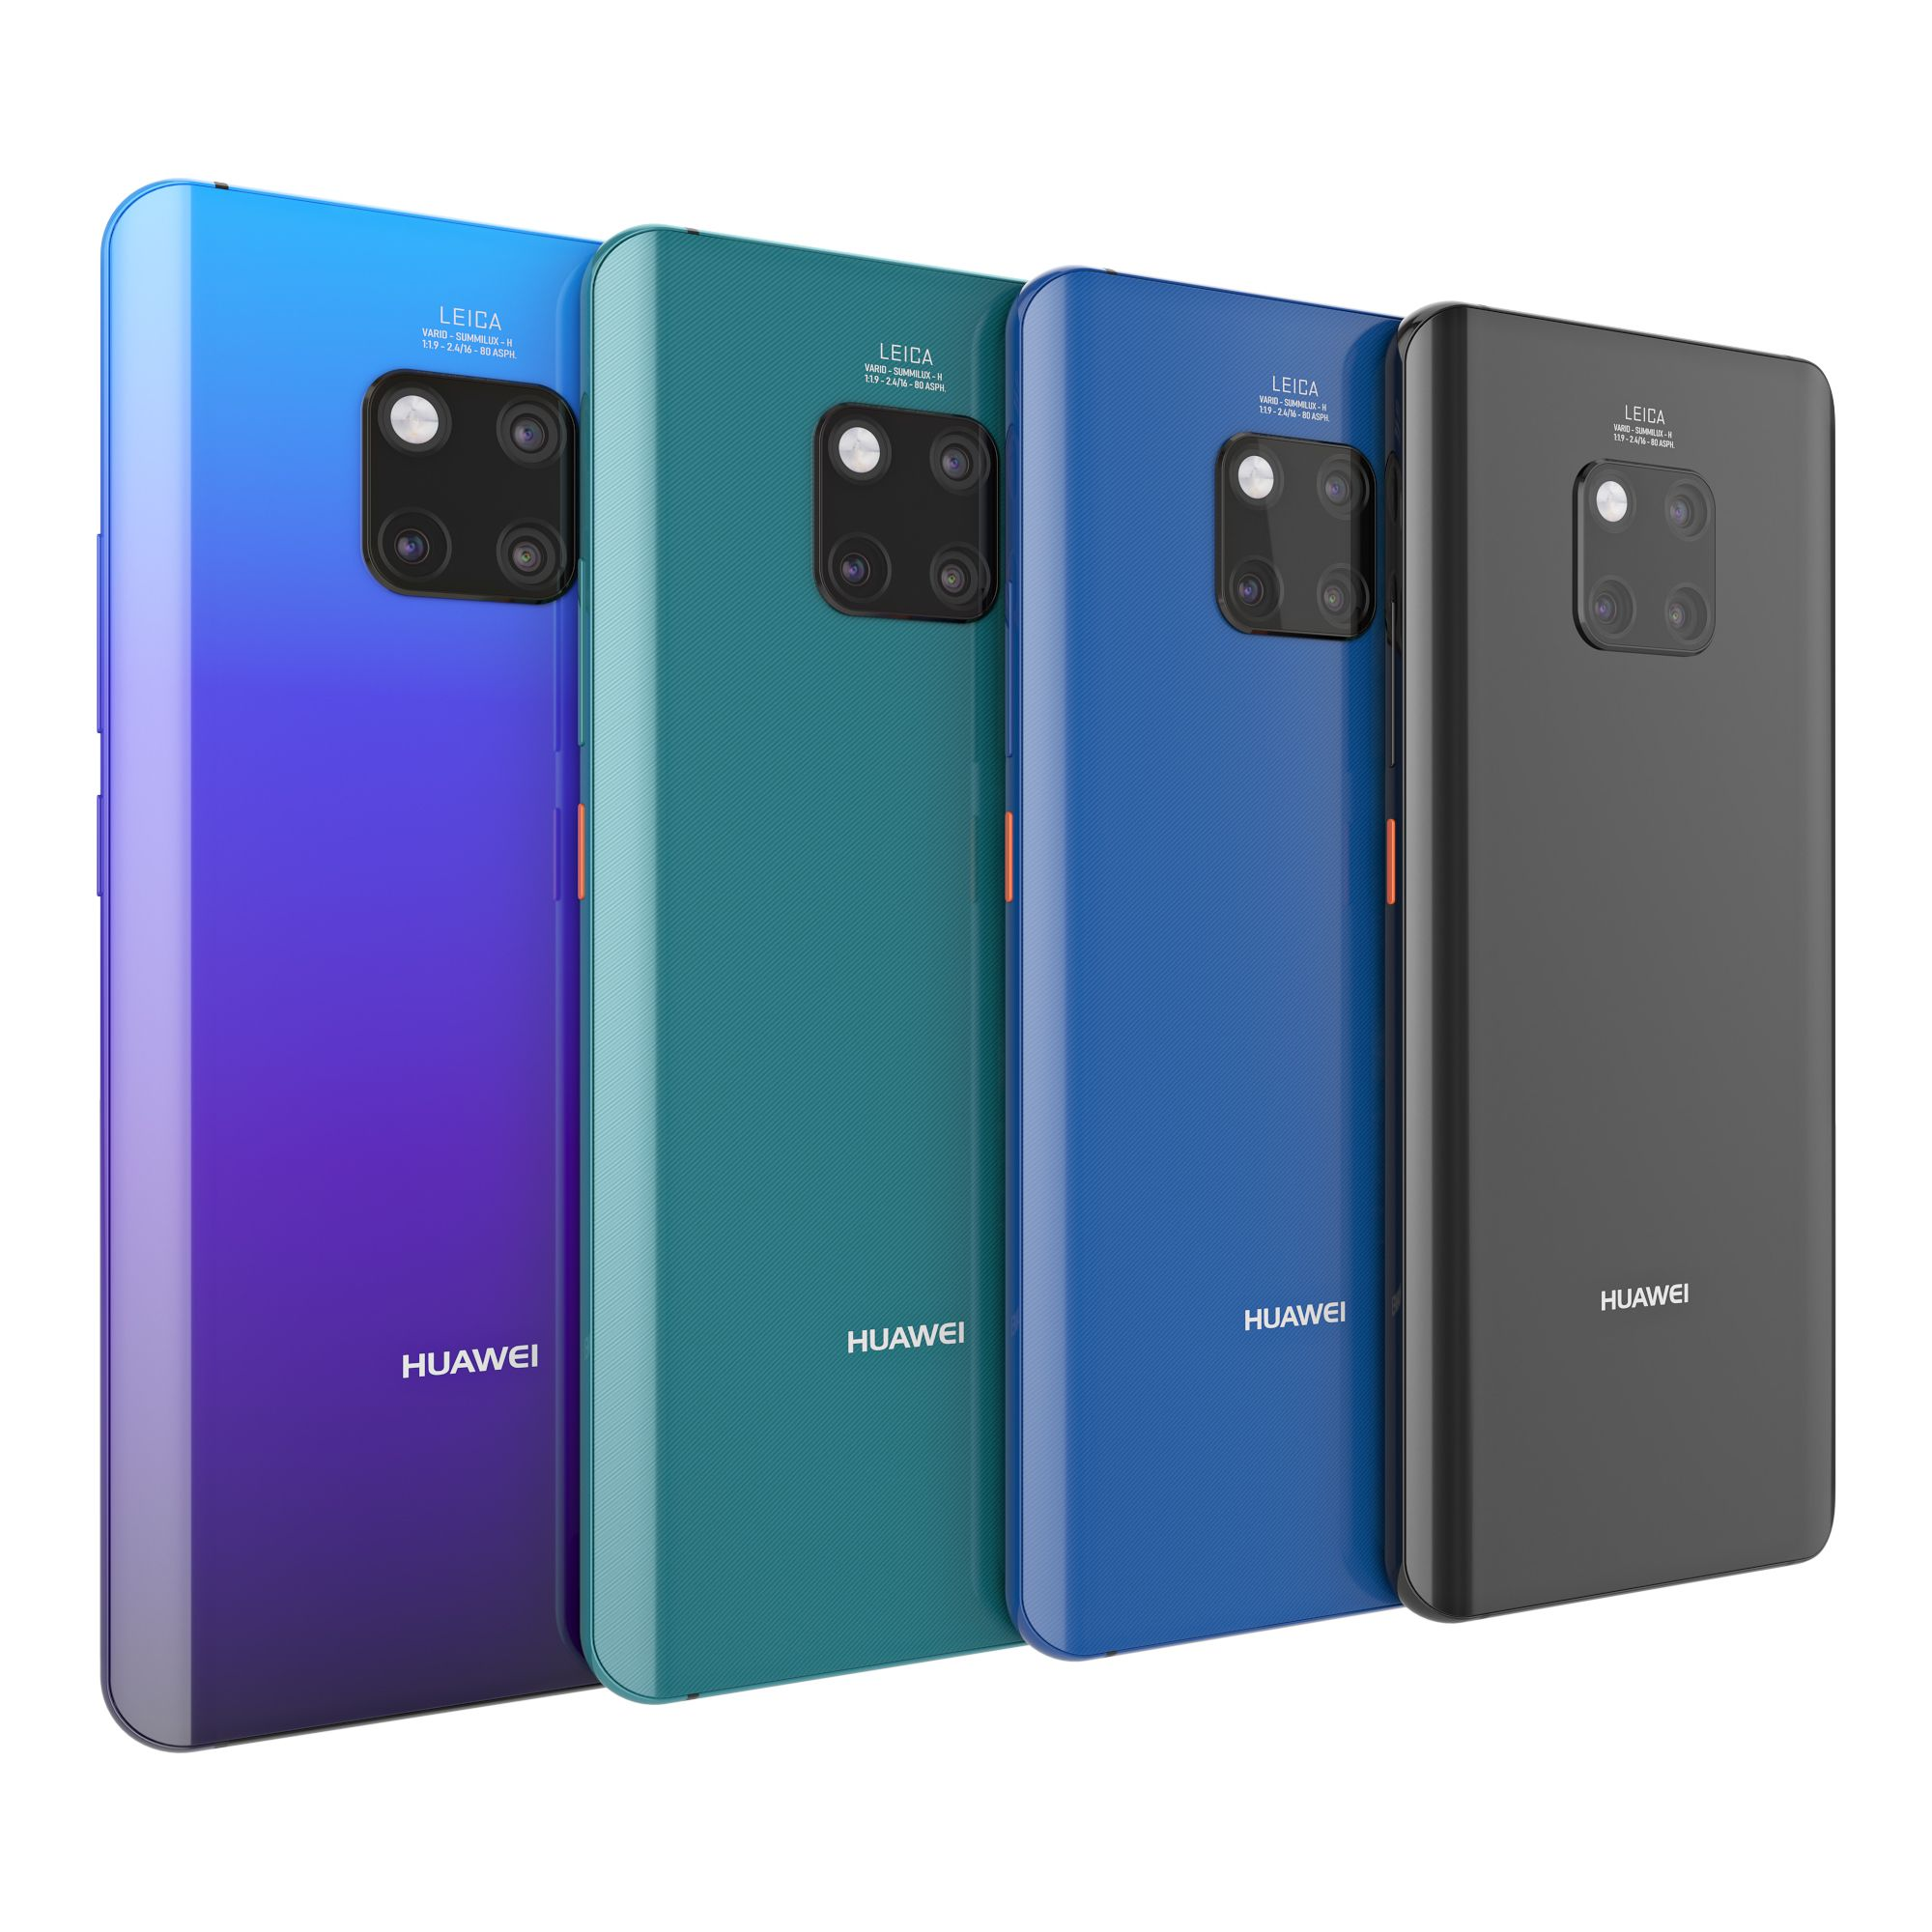 Huawei Mate 20 Pro All Color Huawei Huawei Mate Samsung Phone